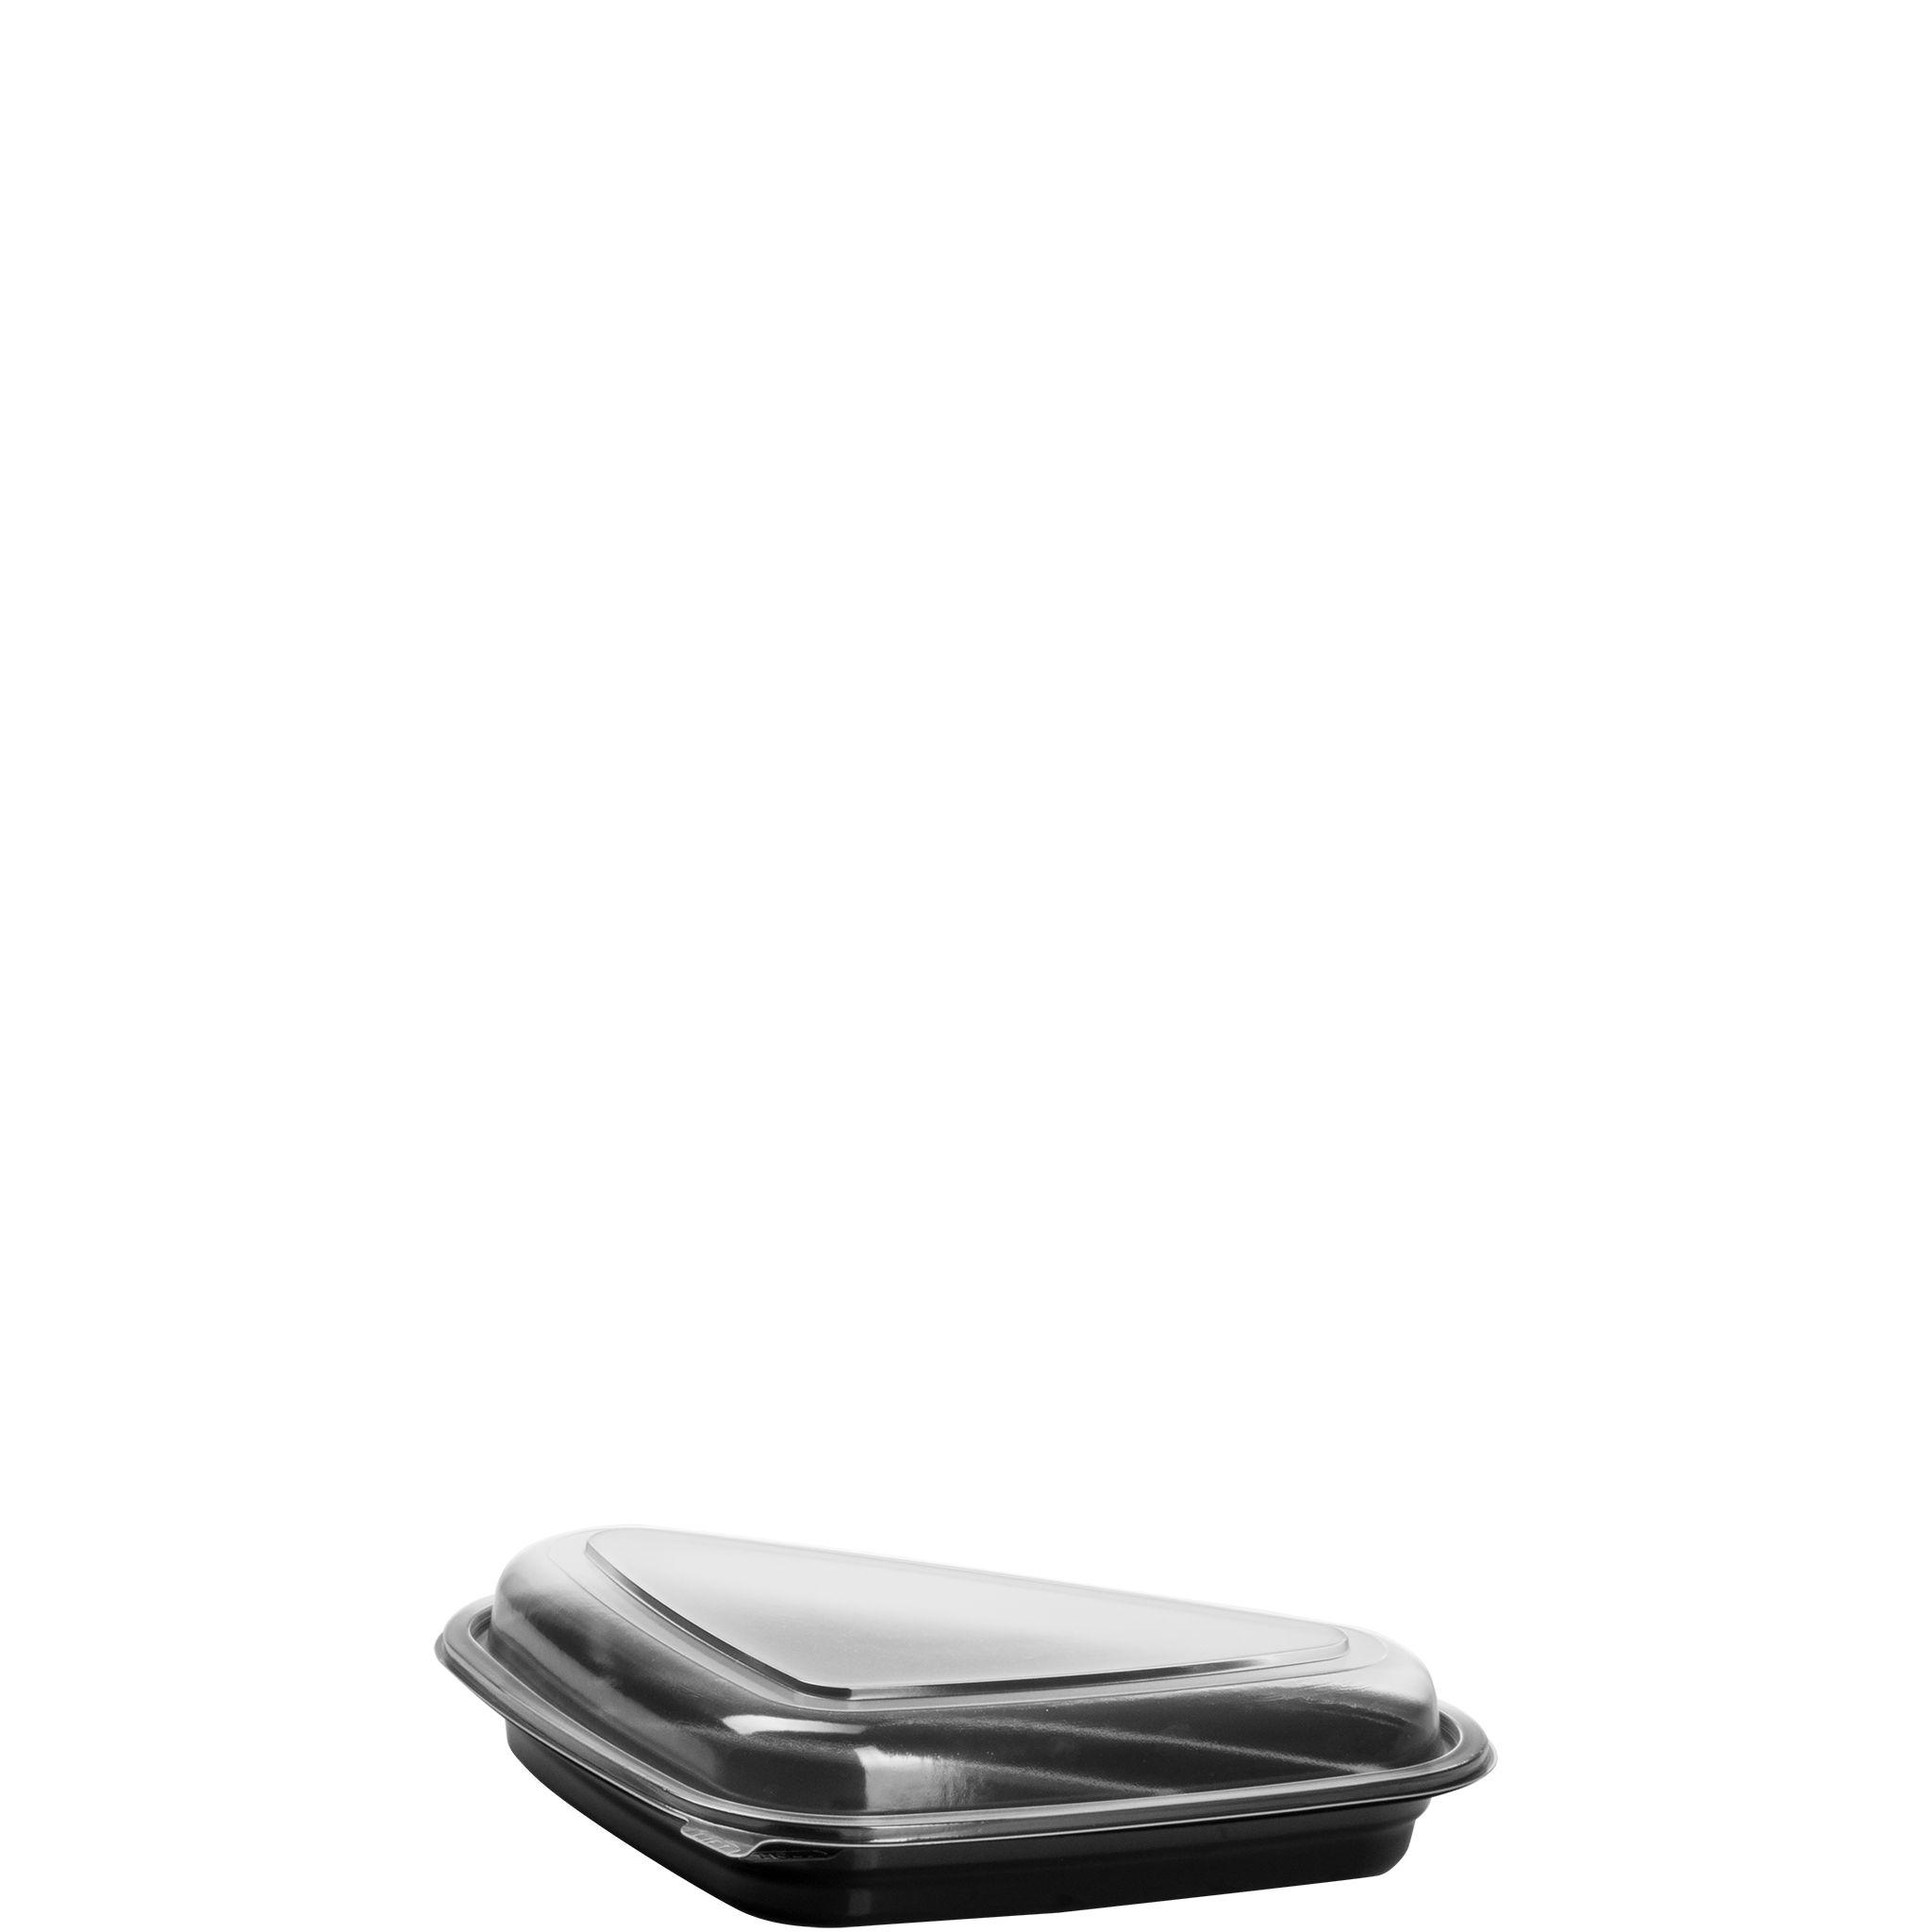 891001-PS94